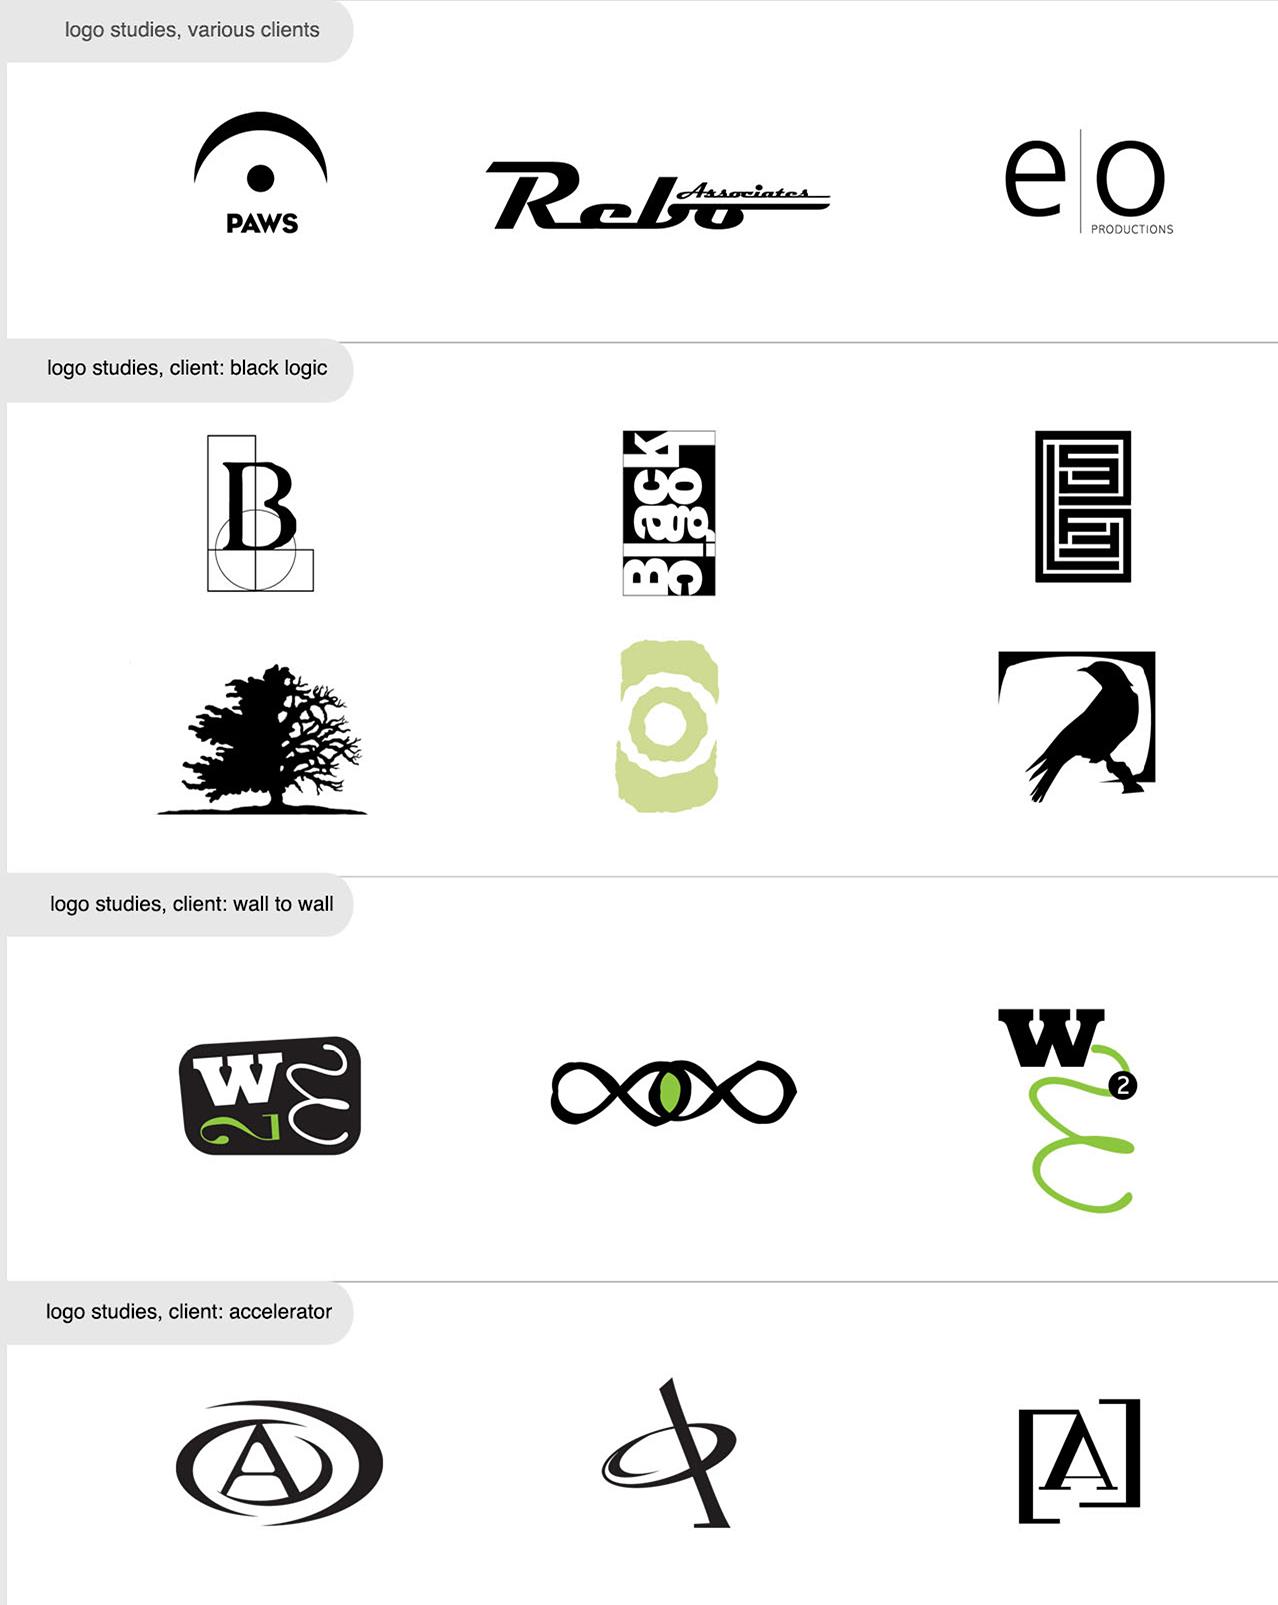 logosMiscellaneousCrop.jpg